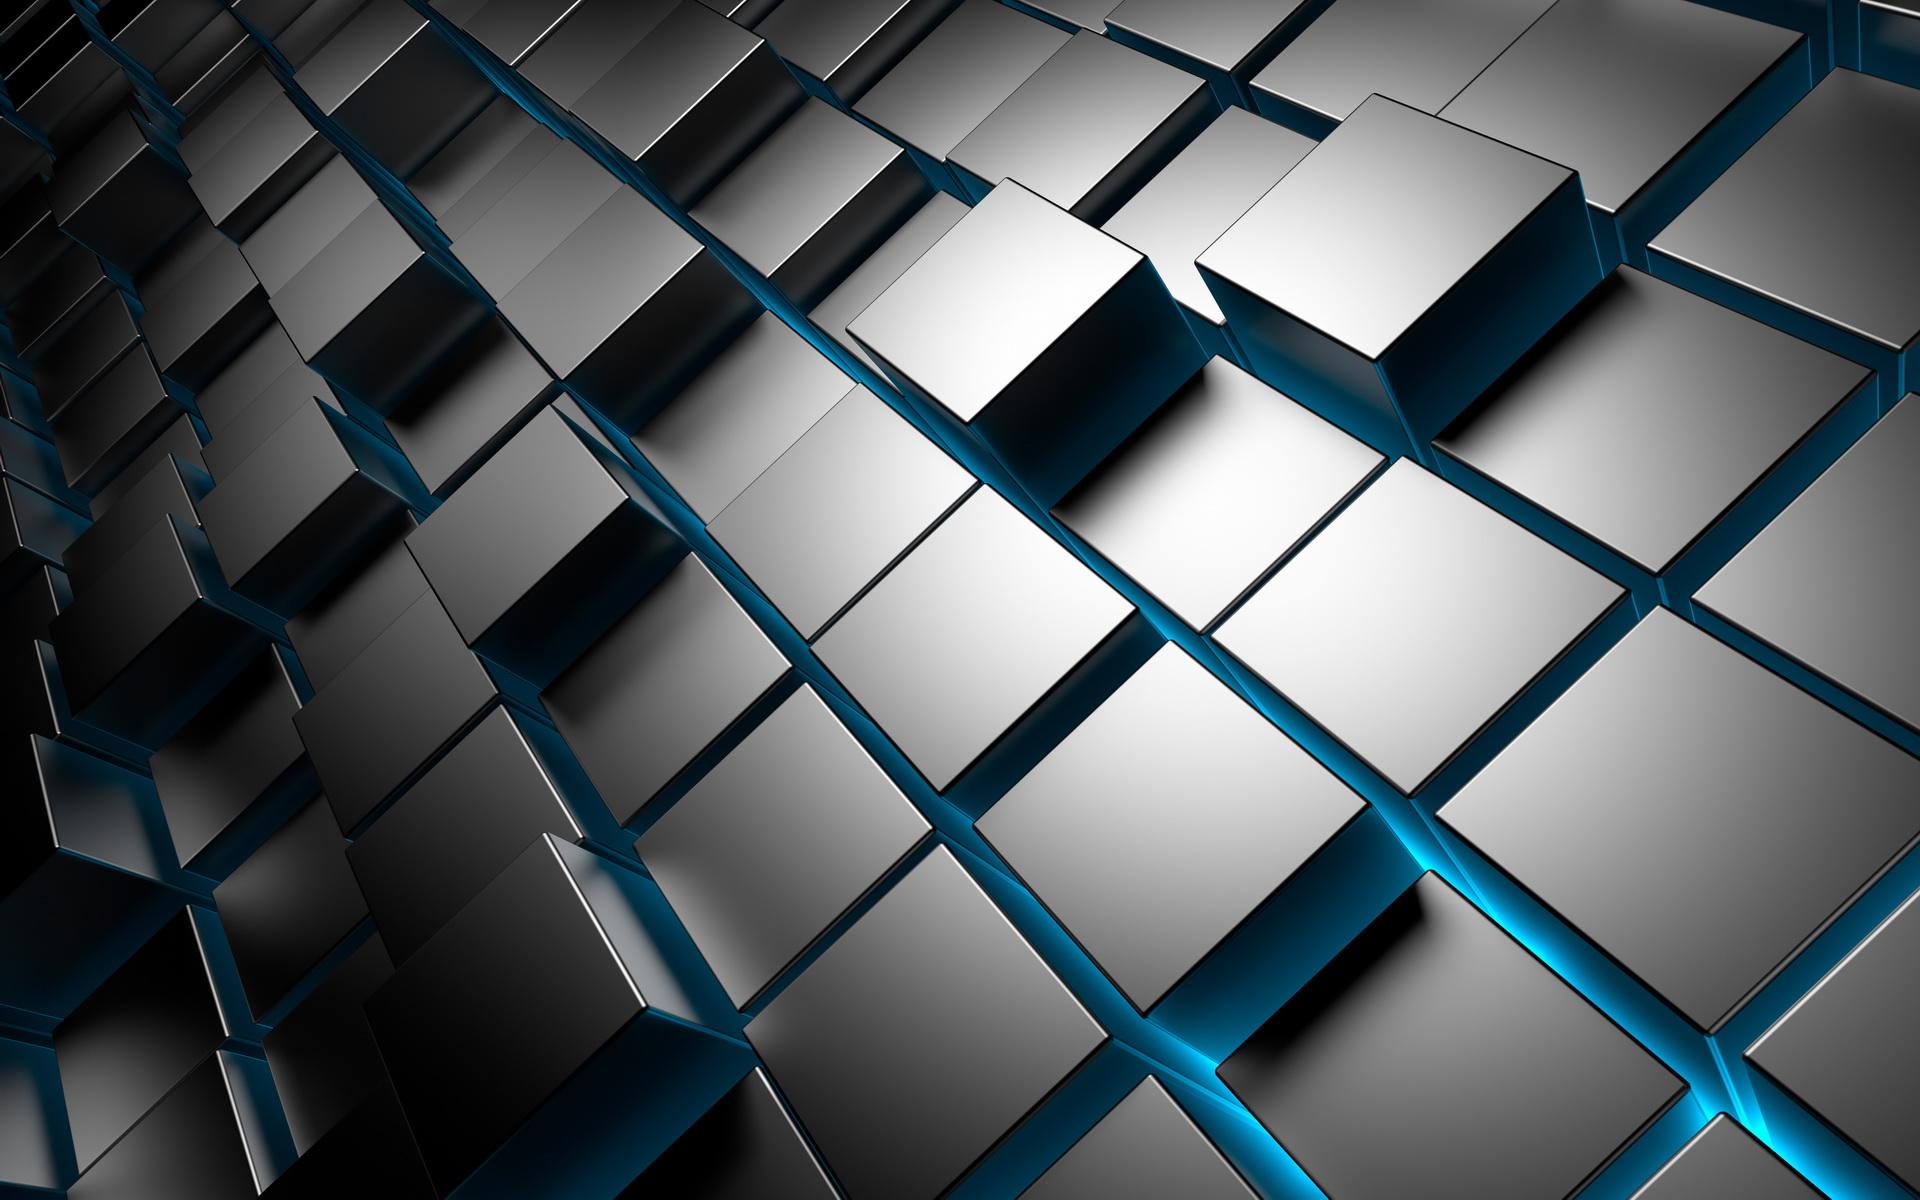 Cube Computer Wallpapers Desktop Backgrounds 1920x1200 ID433999 1920x1200